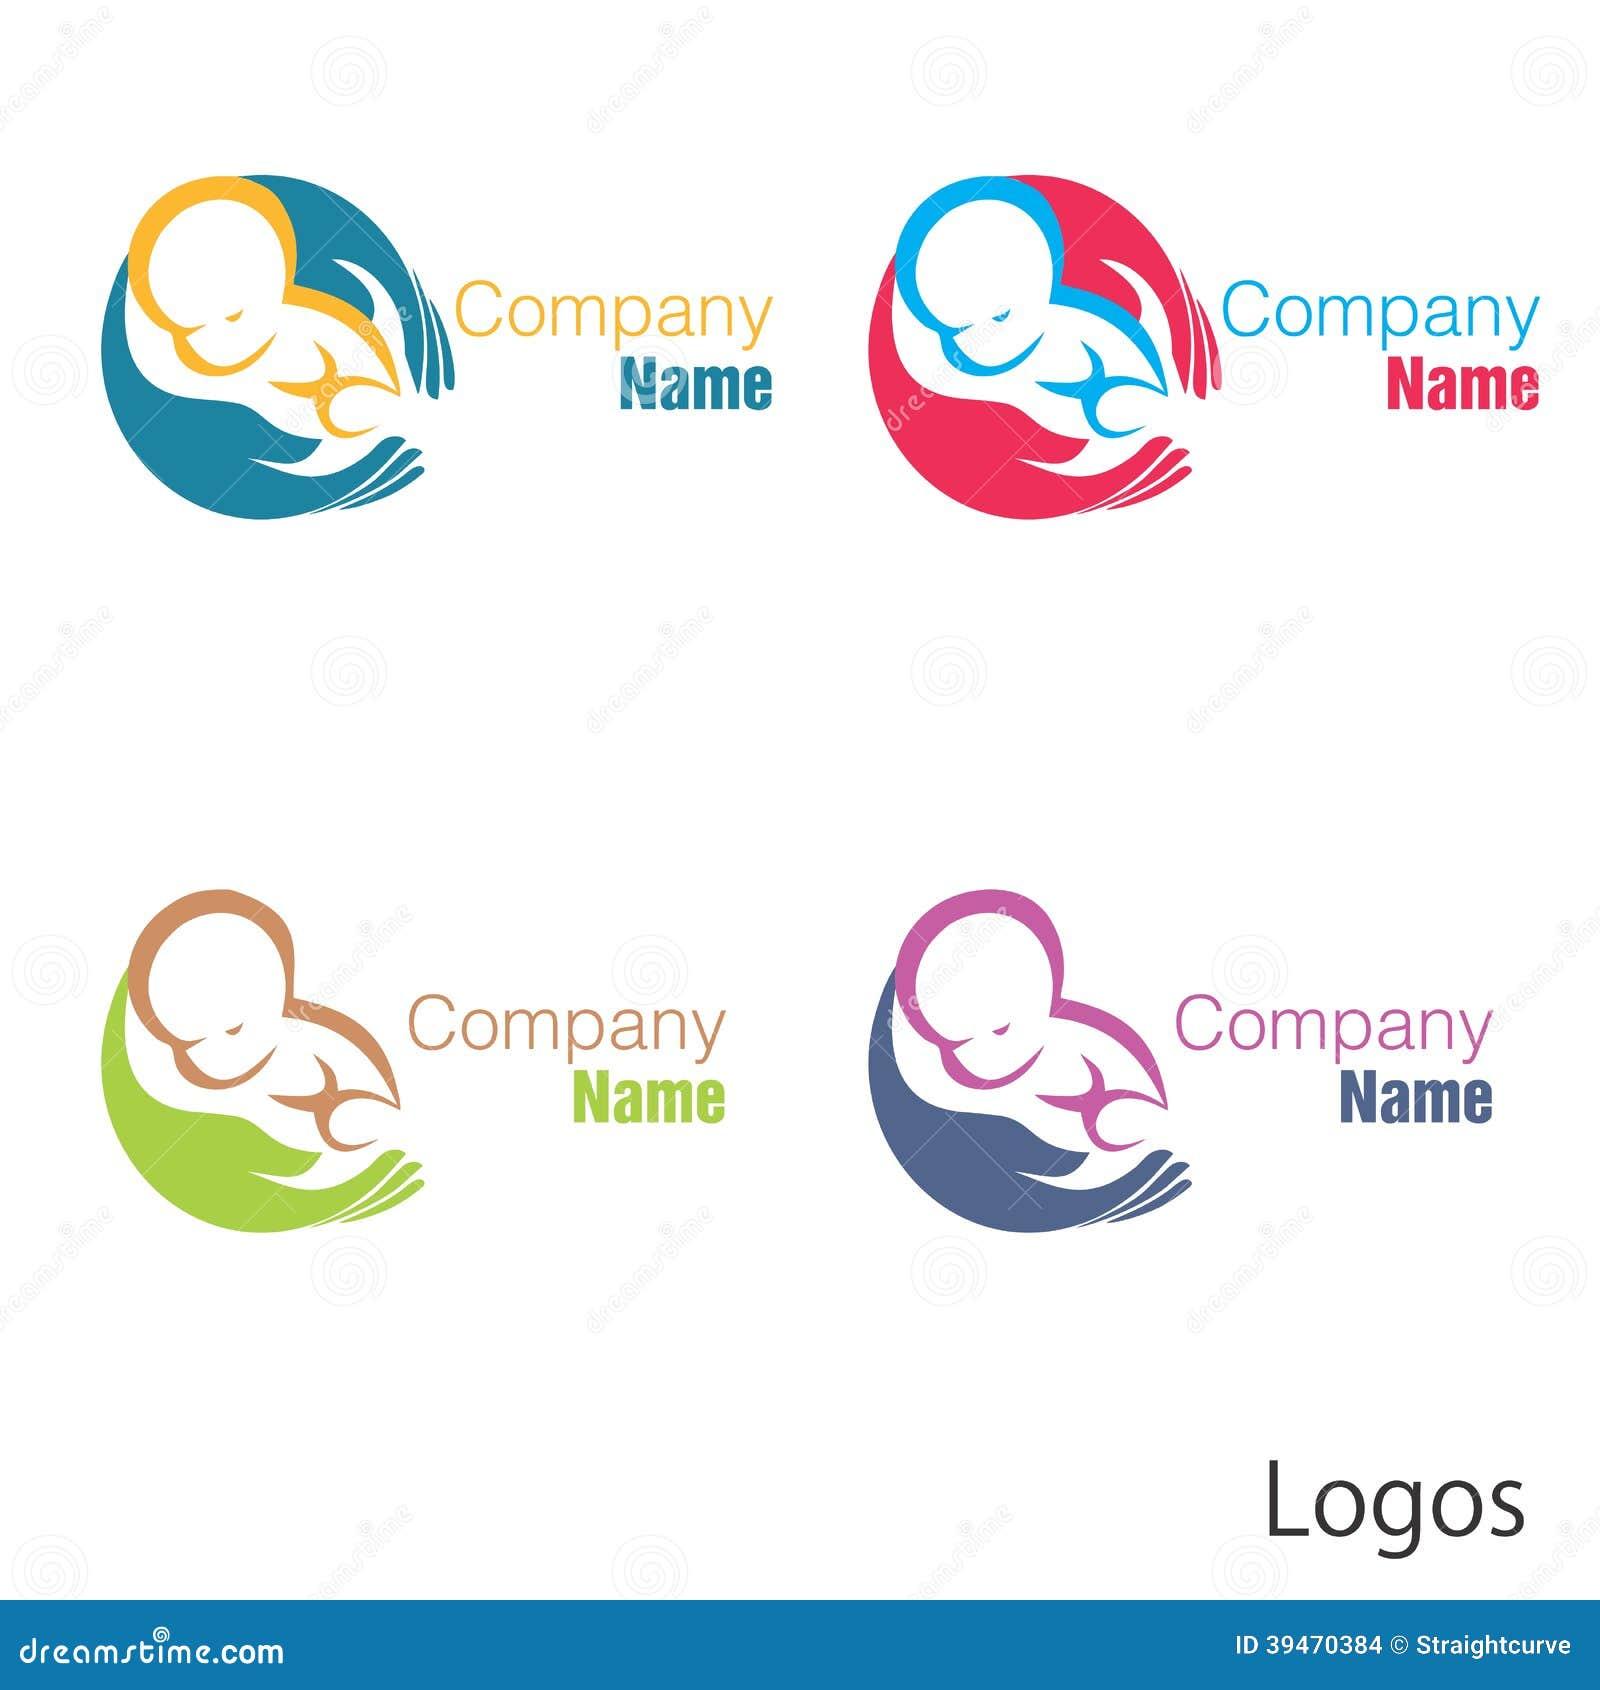 New born baby logo hand